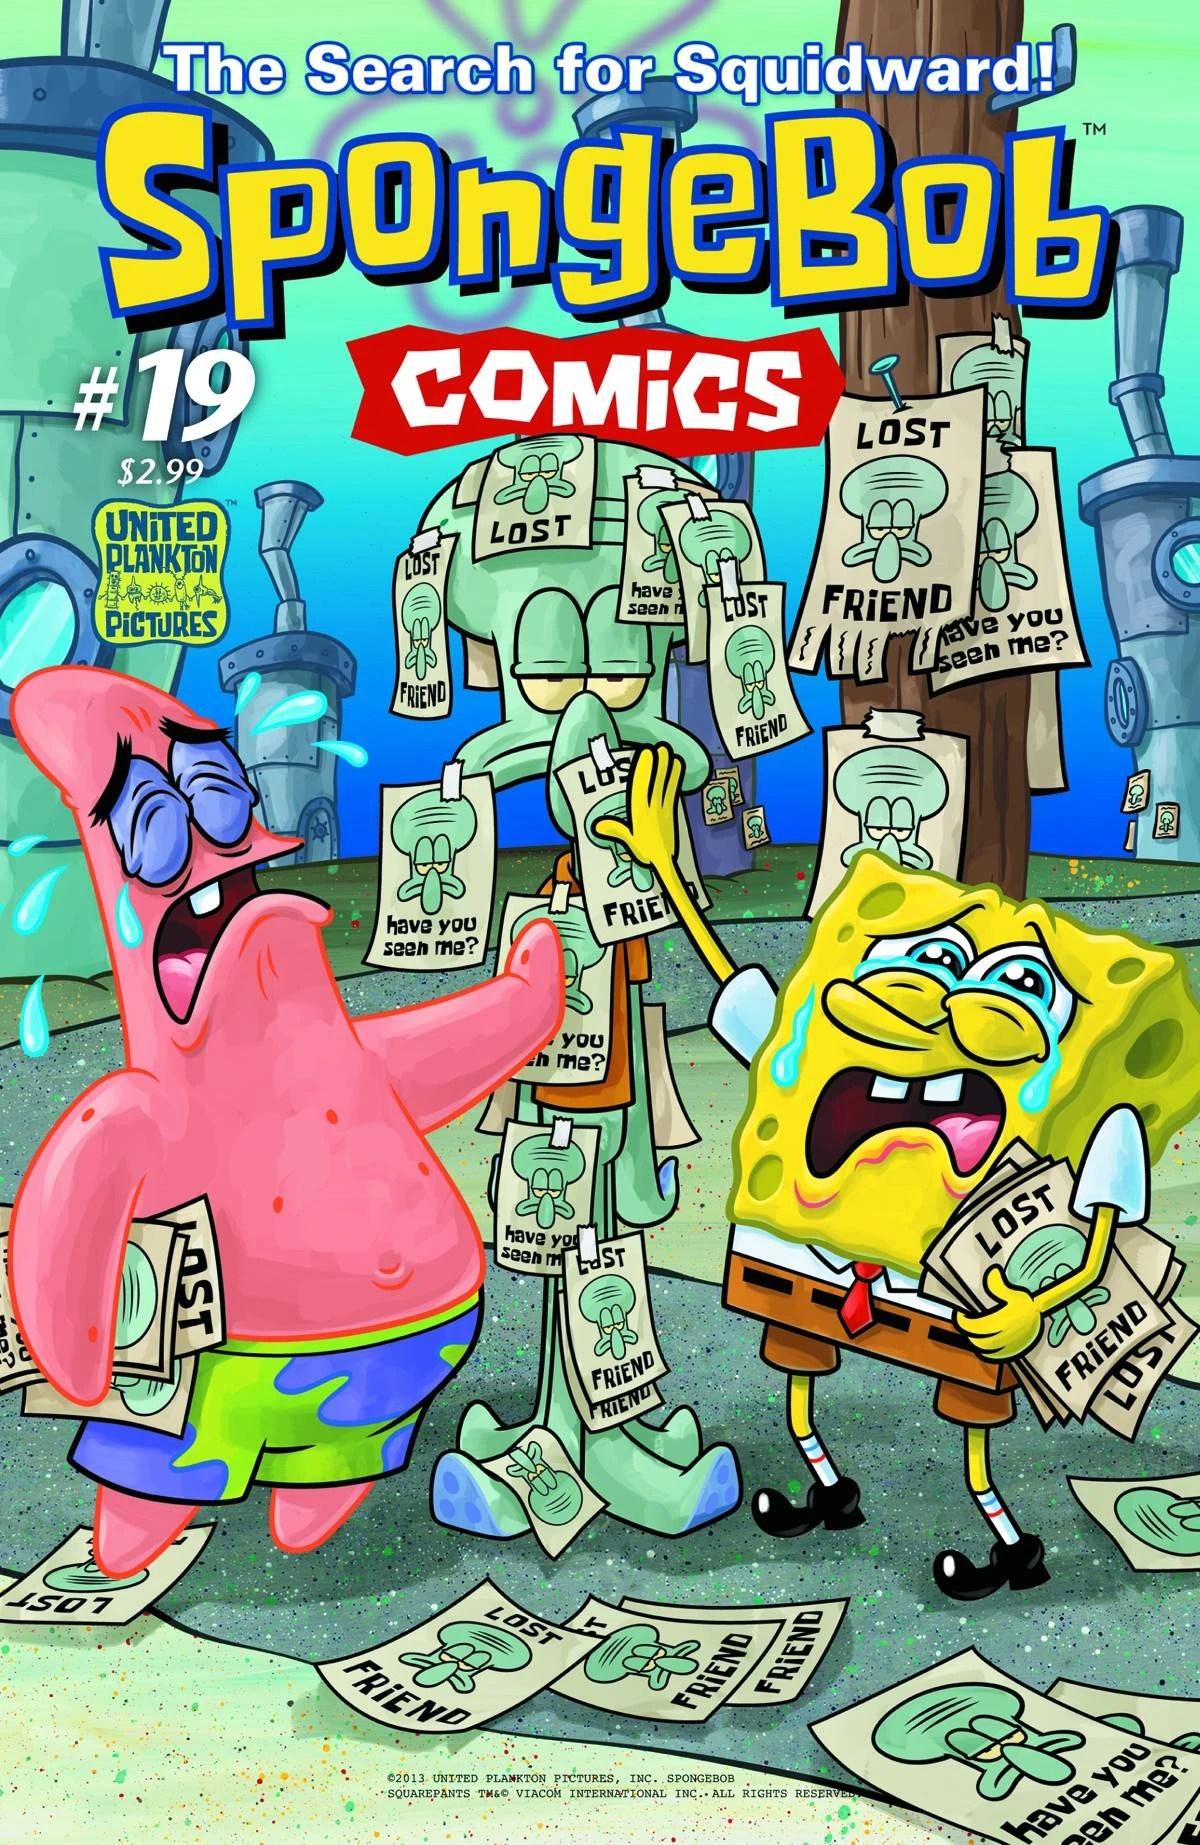 SpongeBob Comics No 19  Encyclopedia SpongeBobia